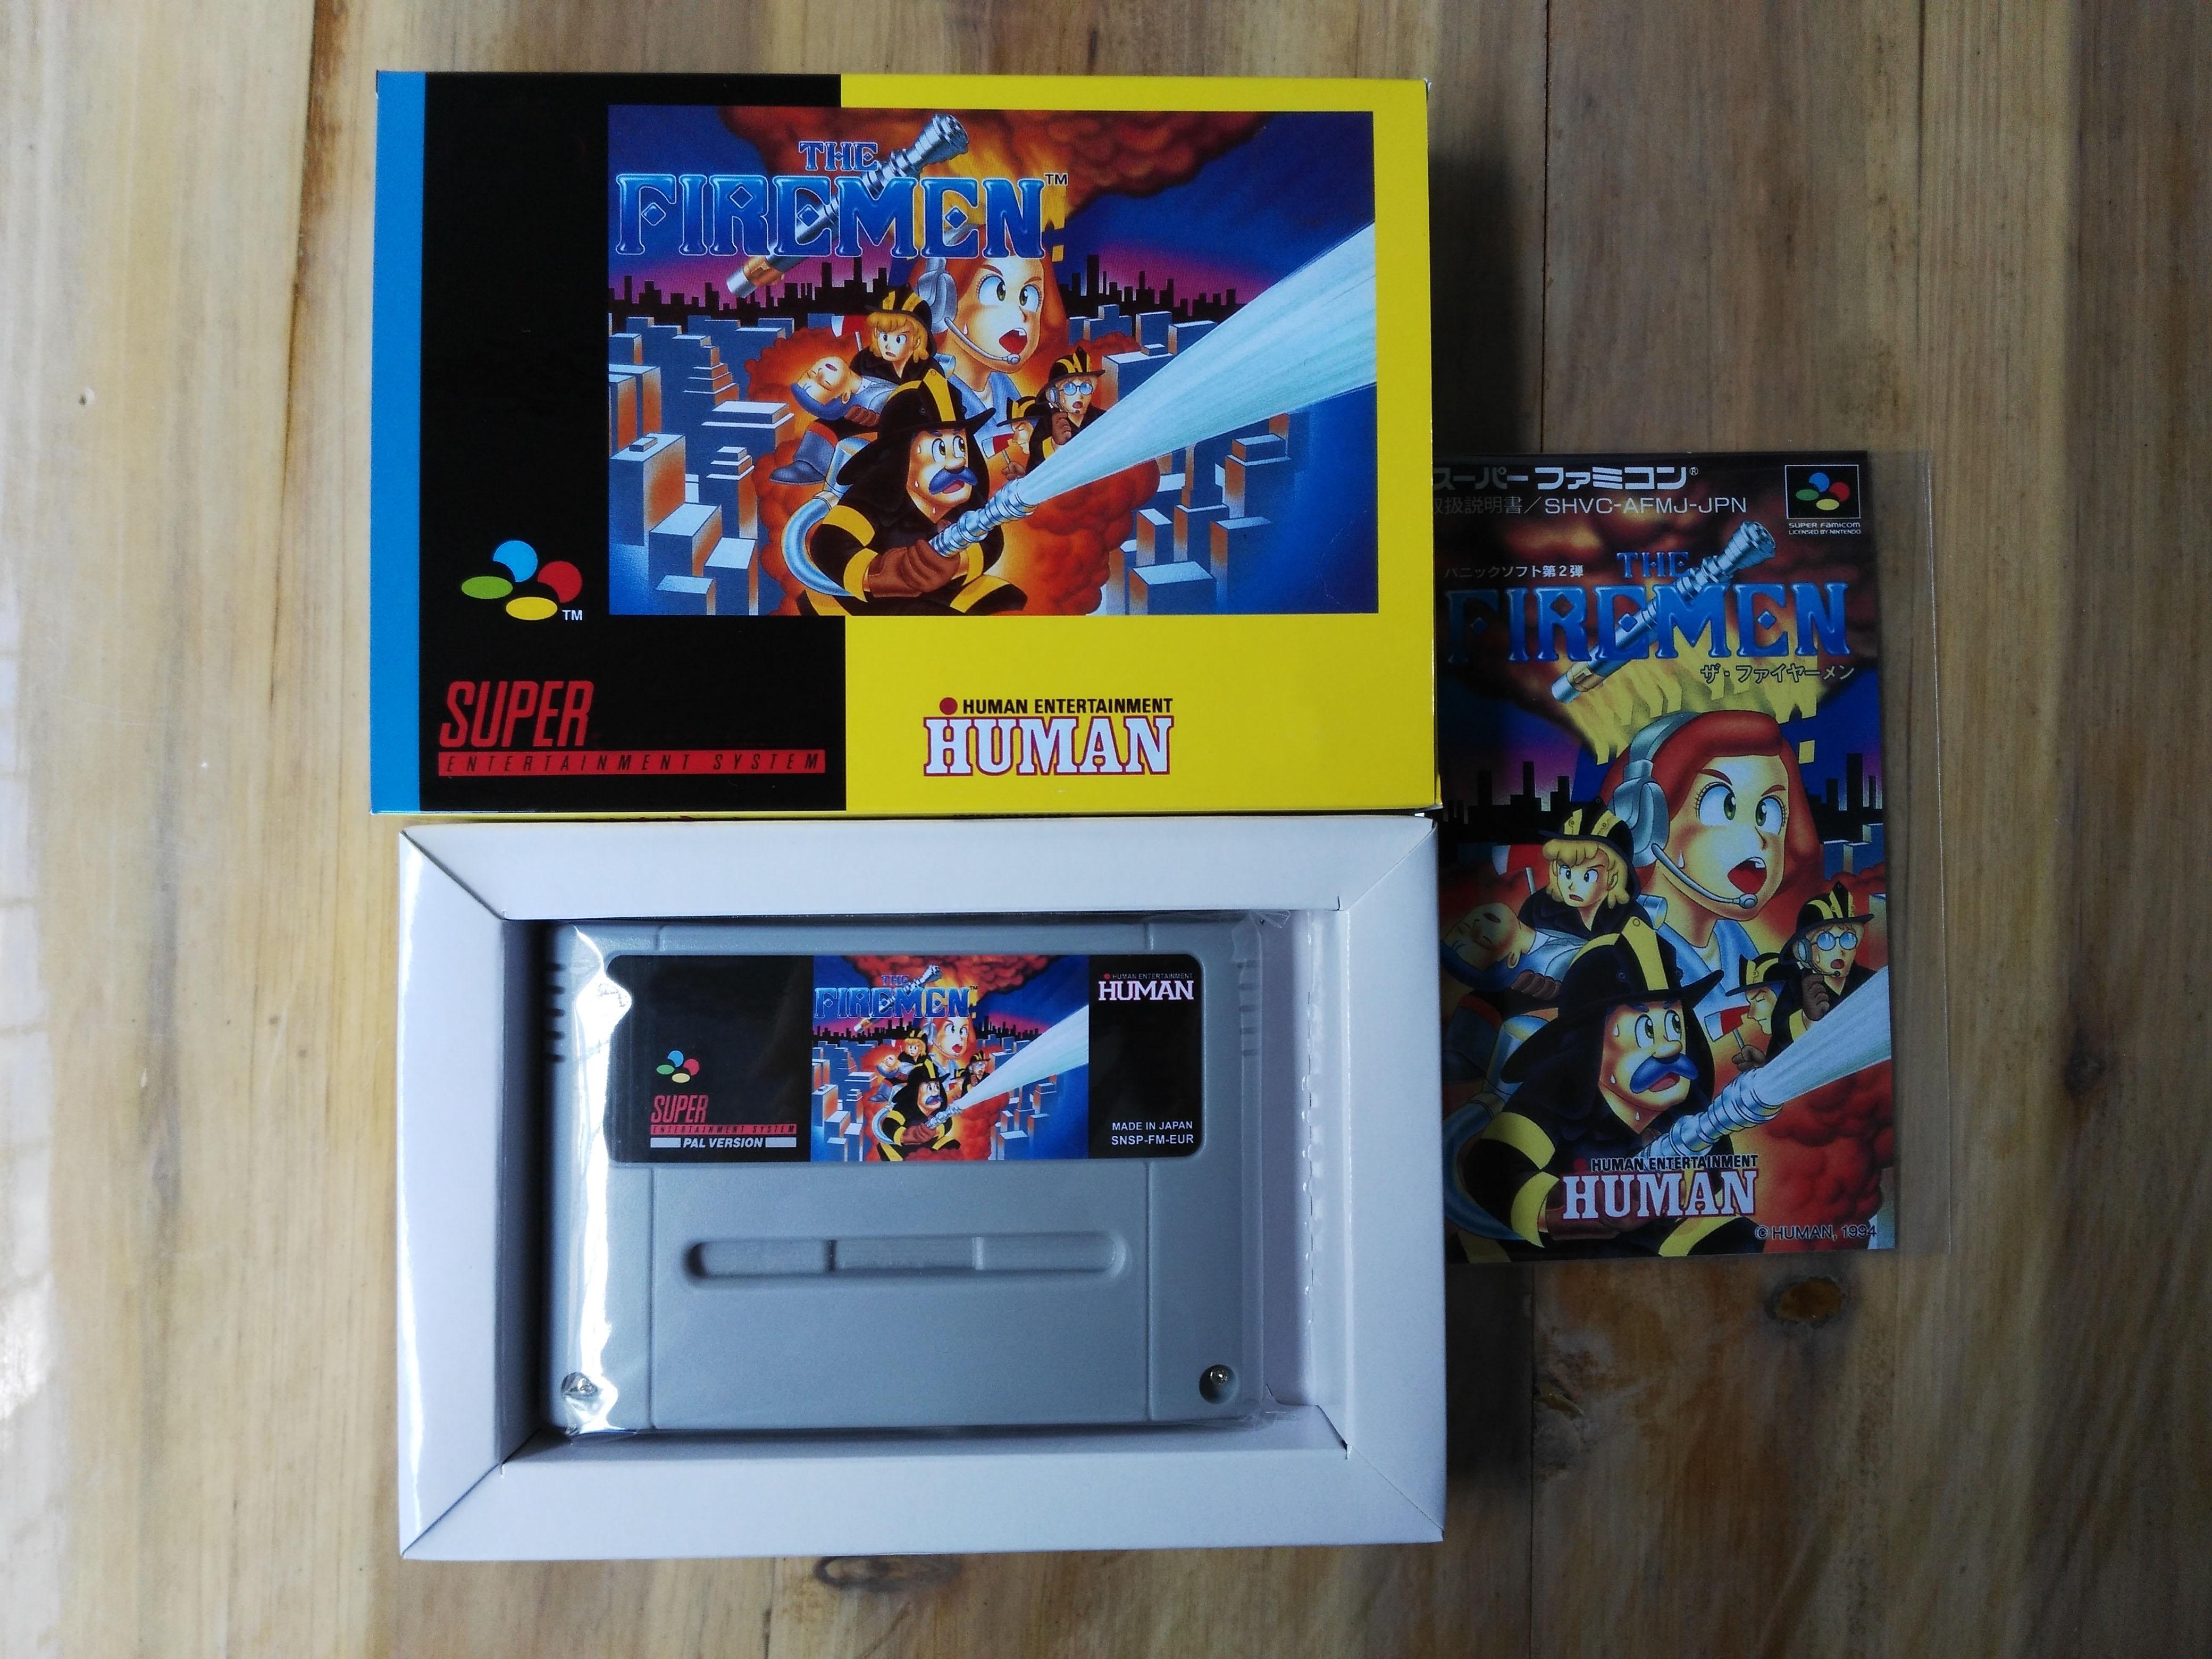 16Bit Games The Firemen PAL Version Box Manual Cartridge